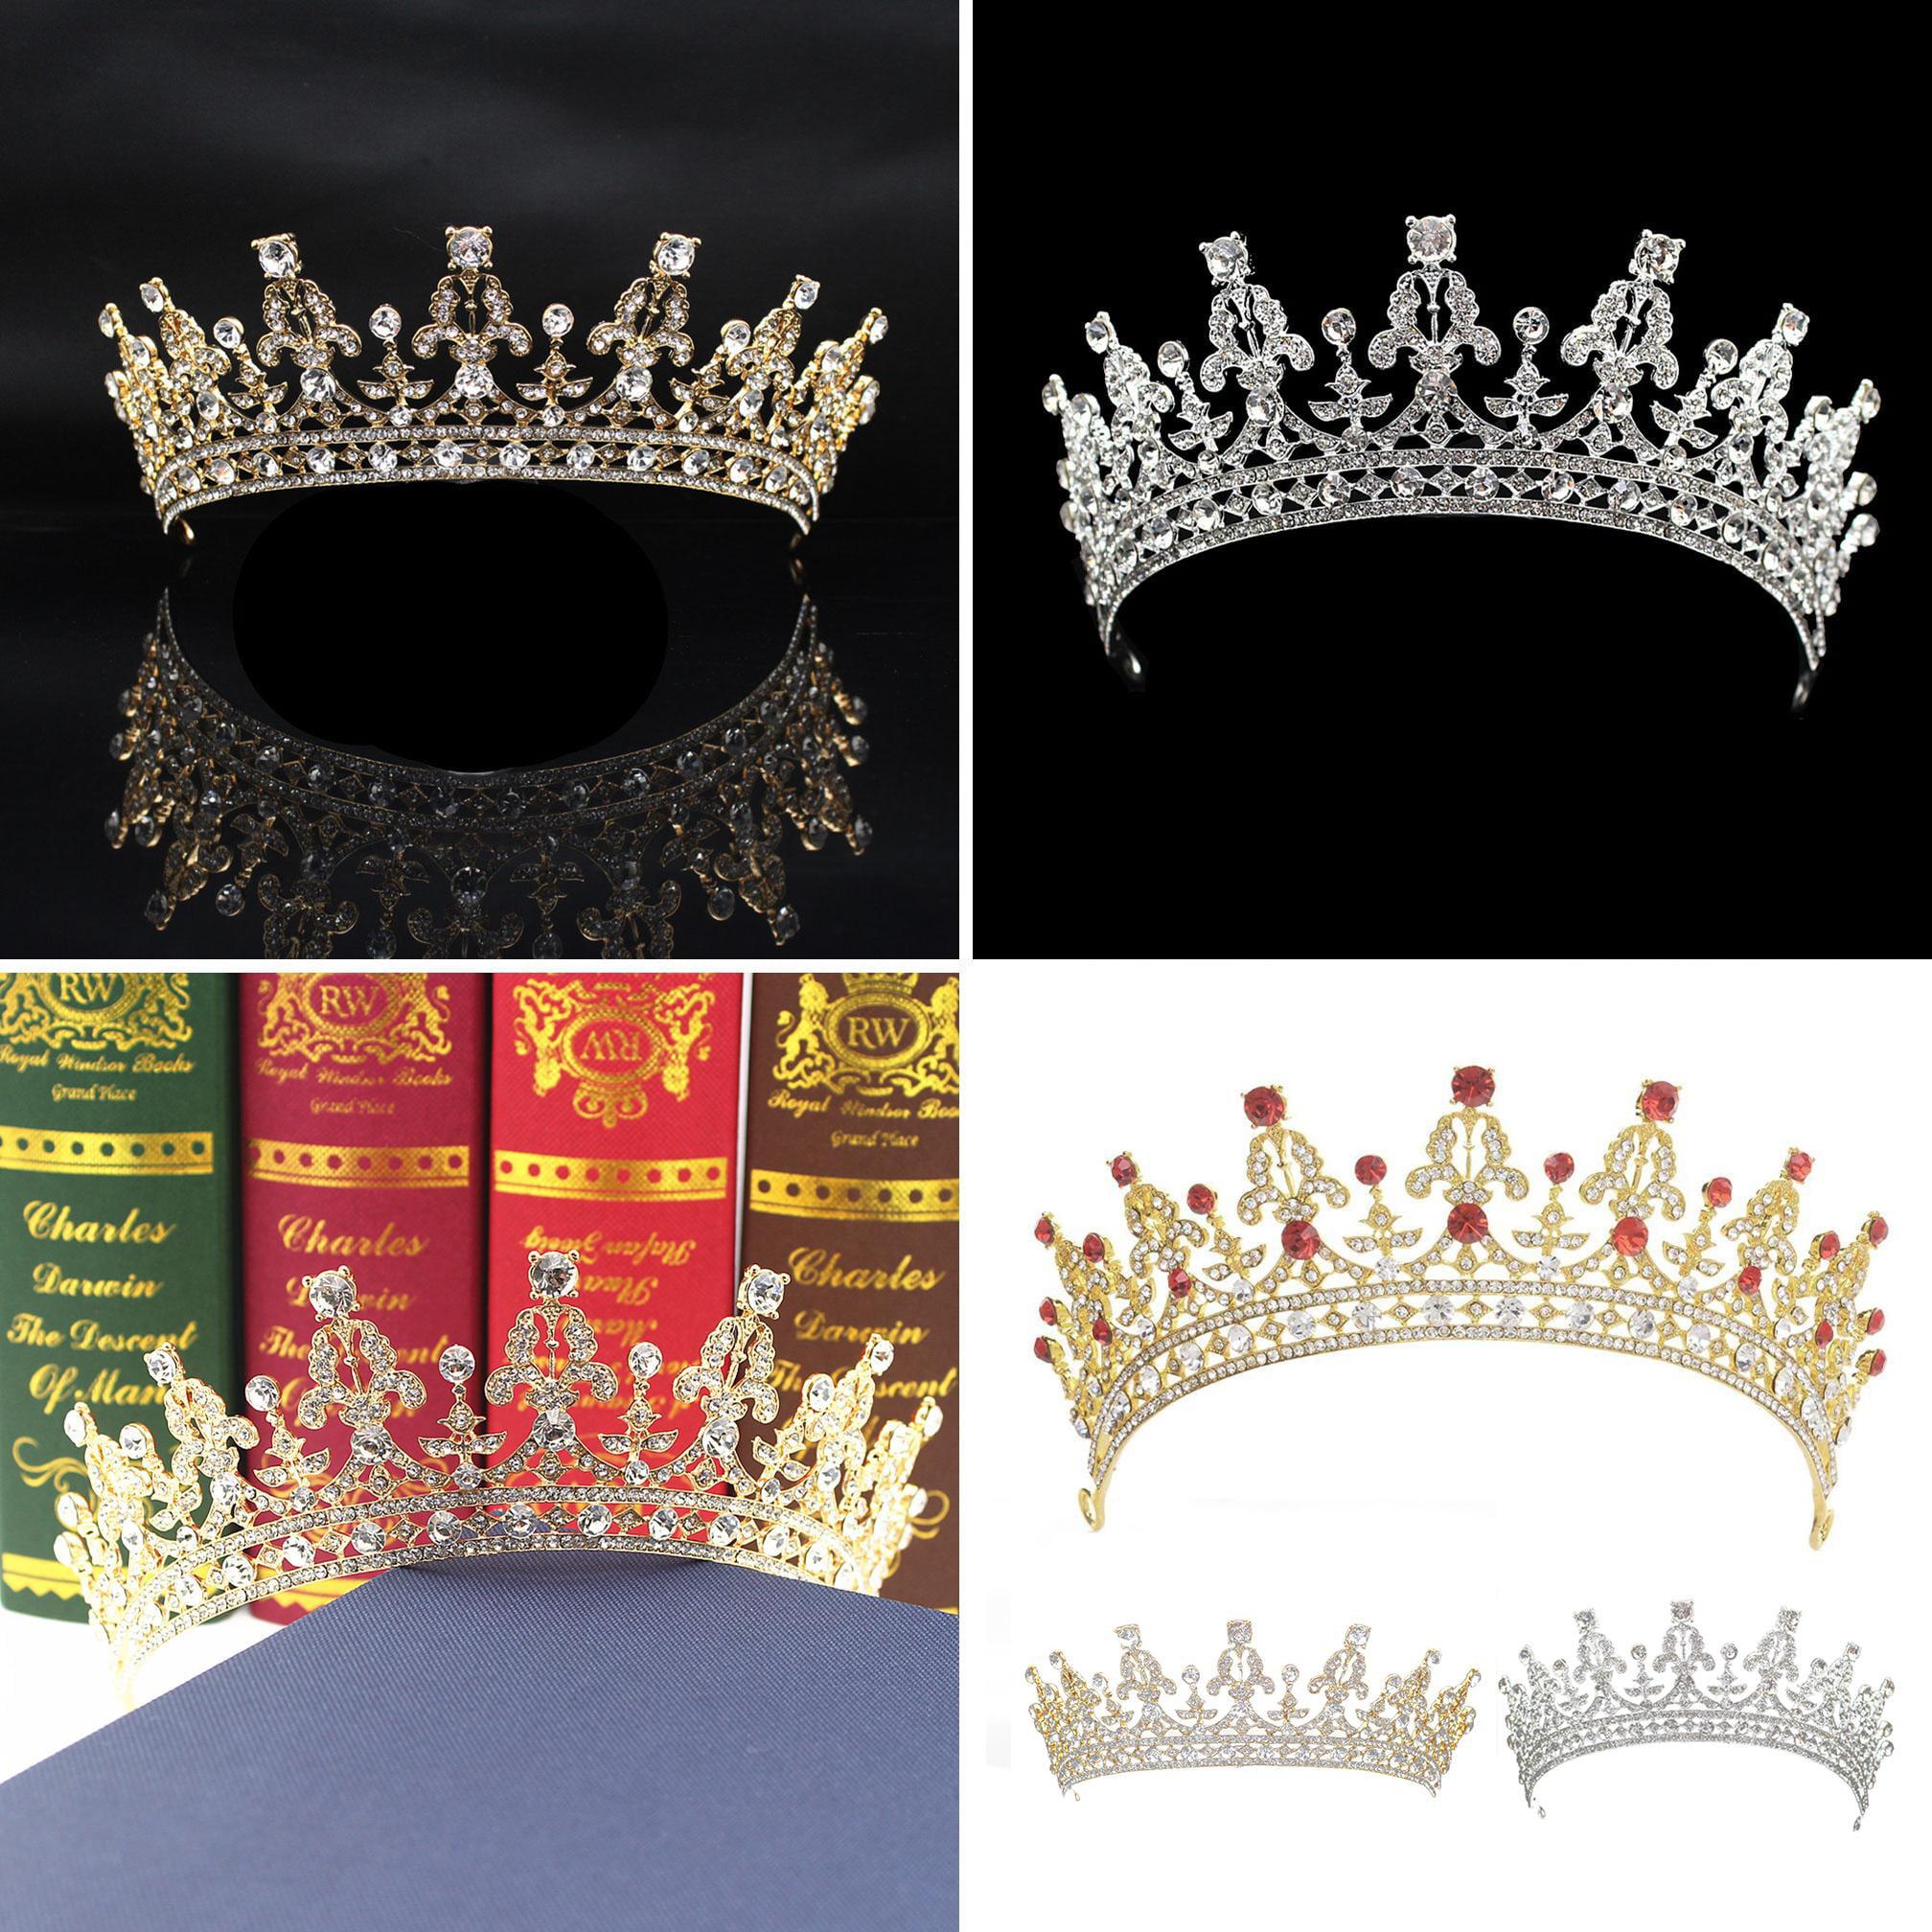 Micelec Luxury Queen Bride Princess Crown Shiny Rhinestone Headband Women's Jewelry